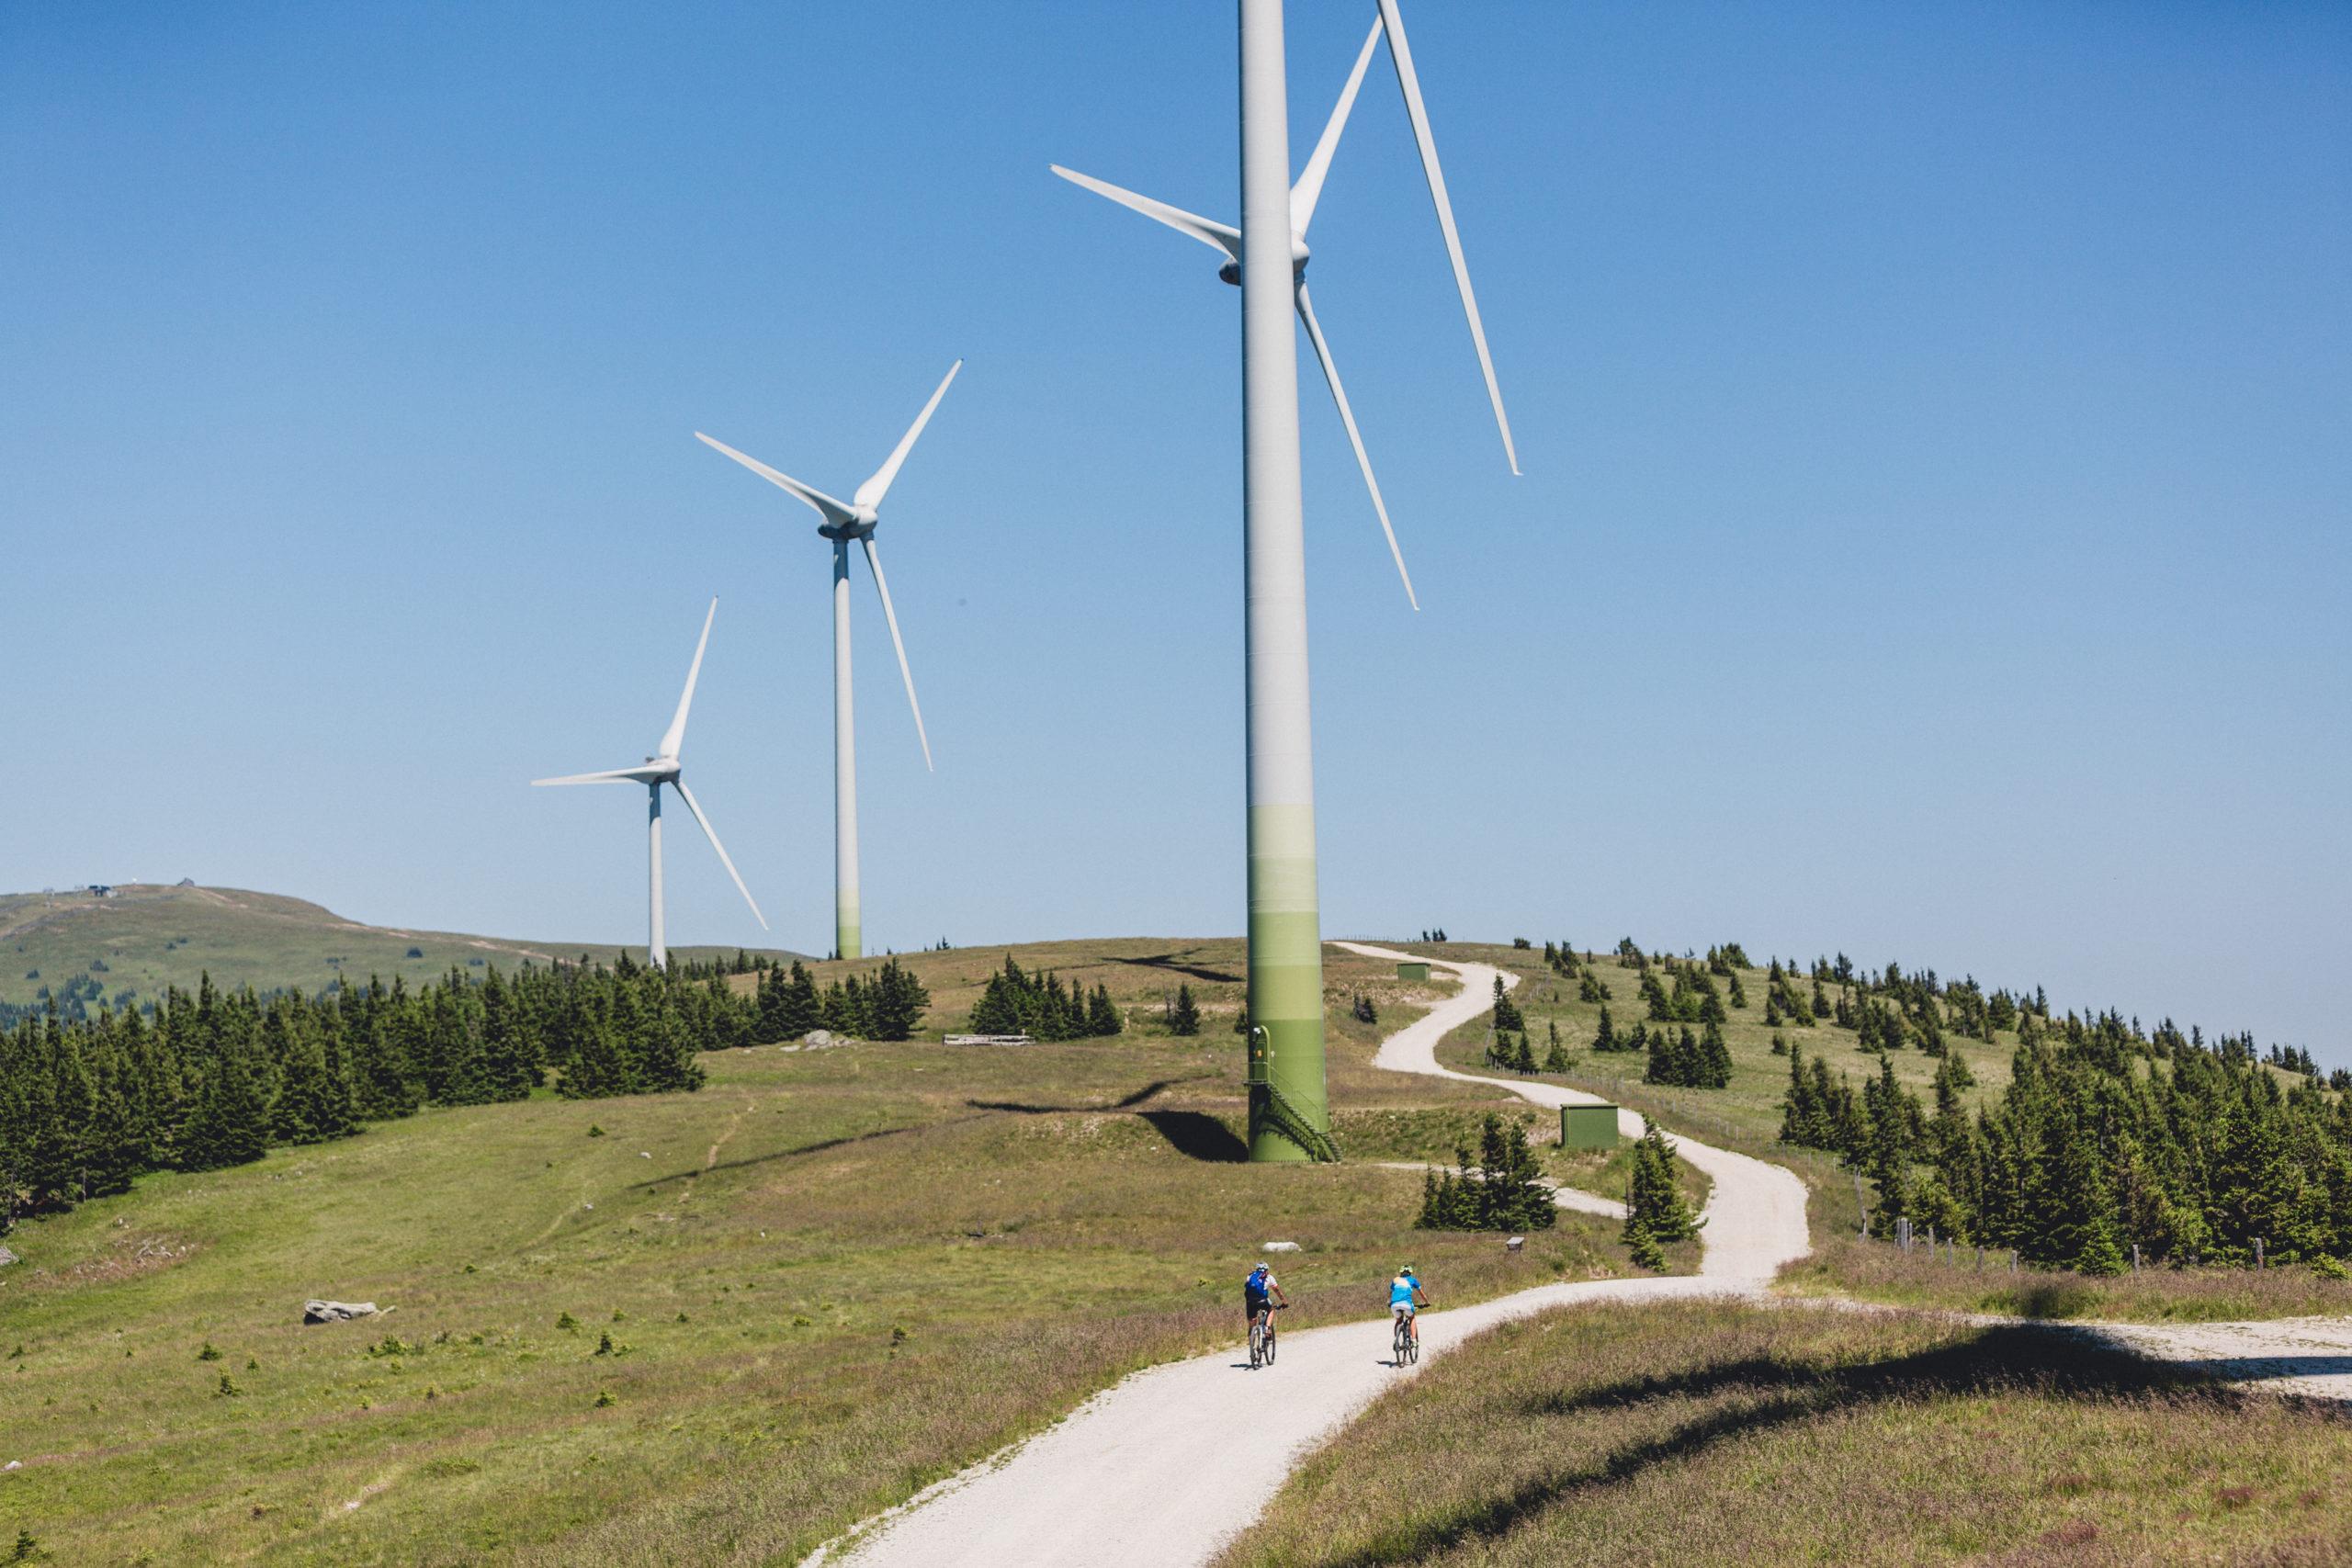 Windpark Pretul - ein toller Ausflug im Radurlaub